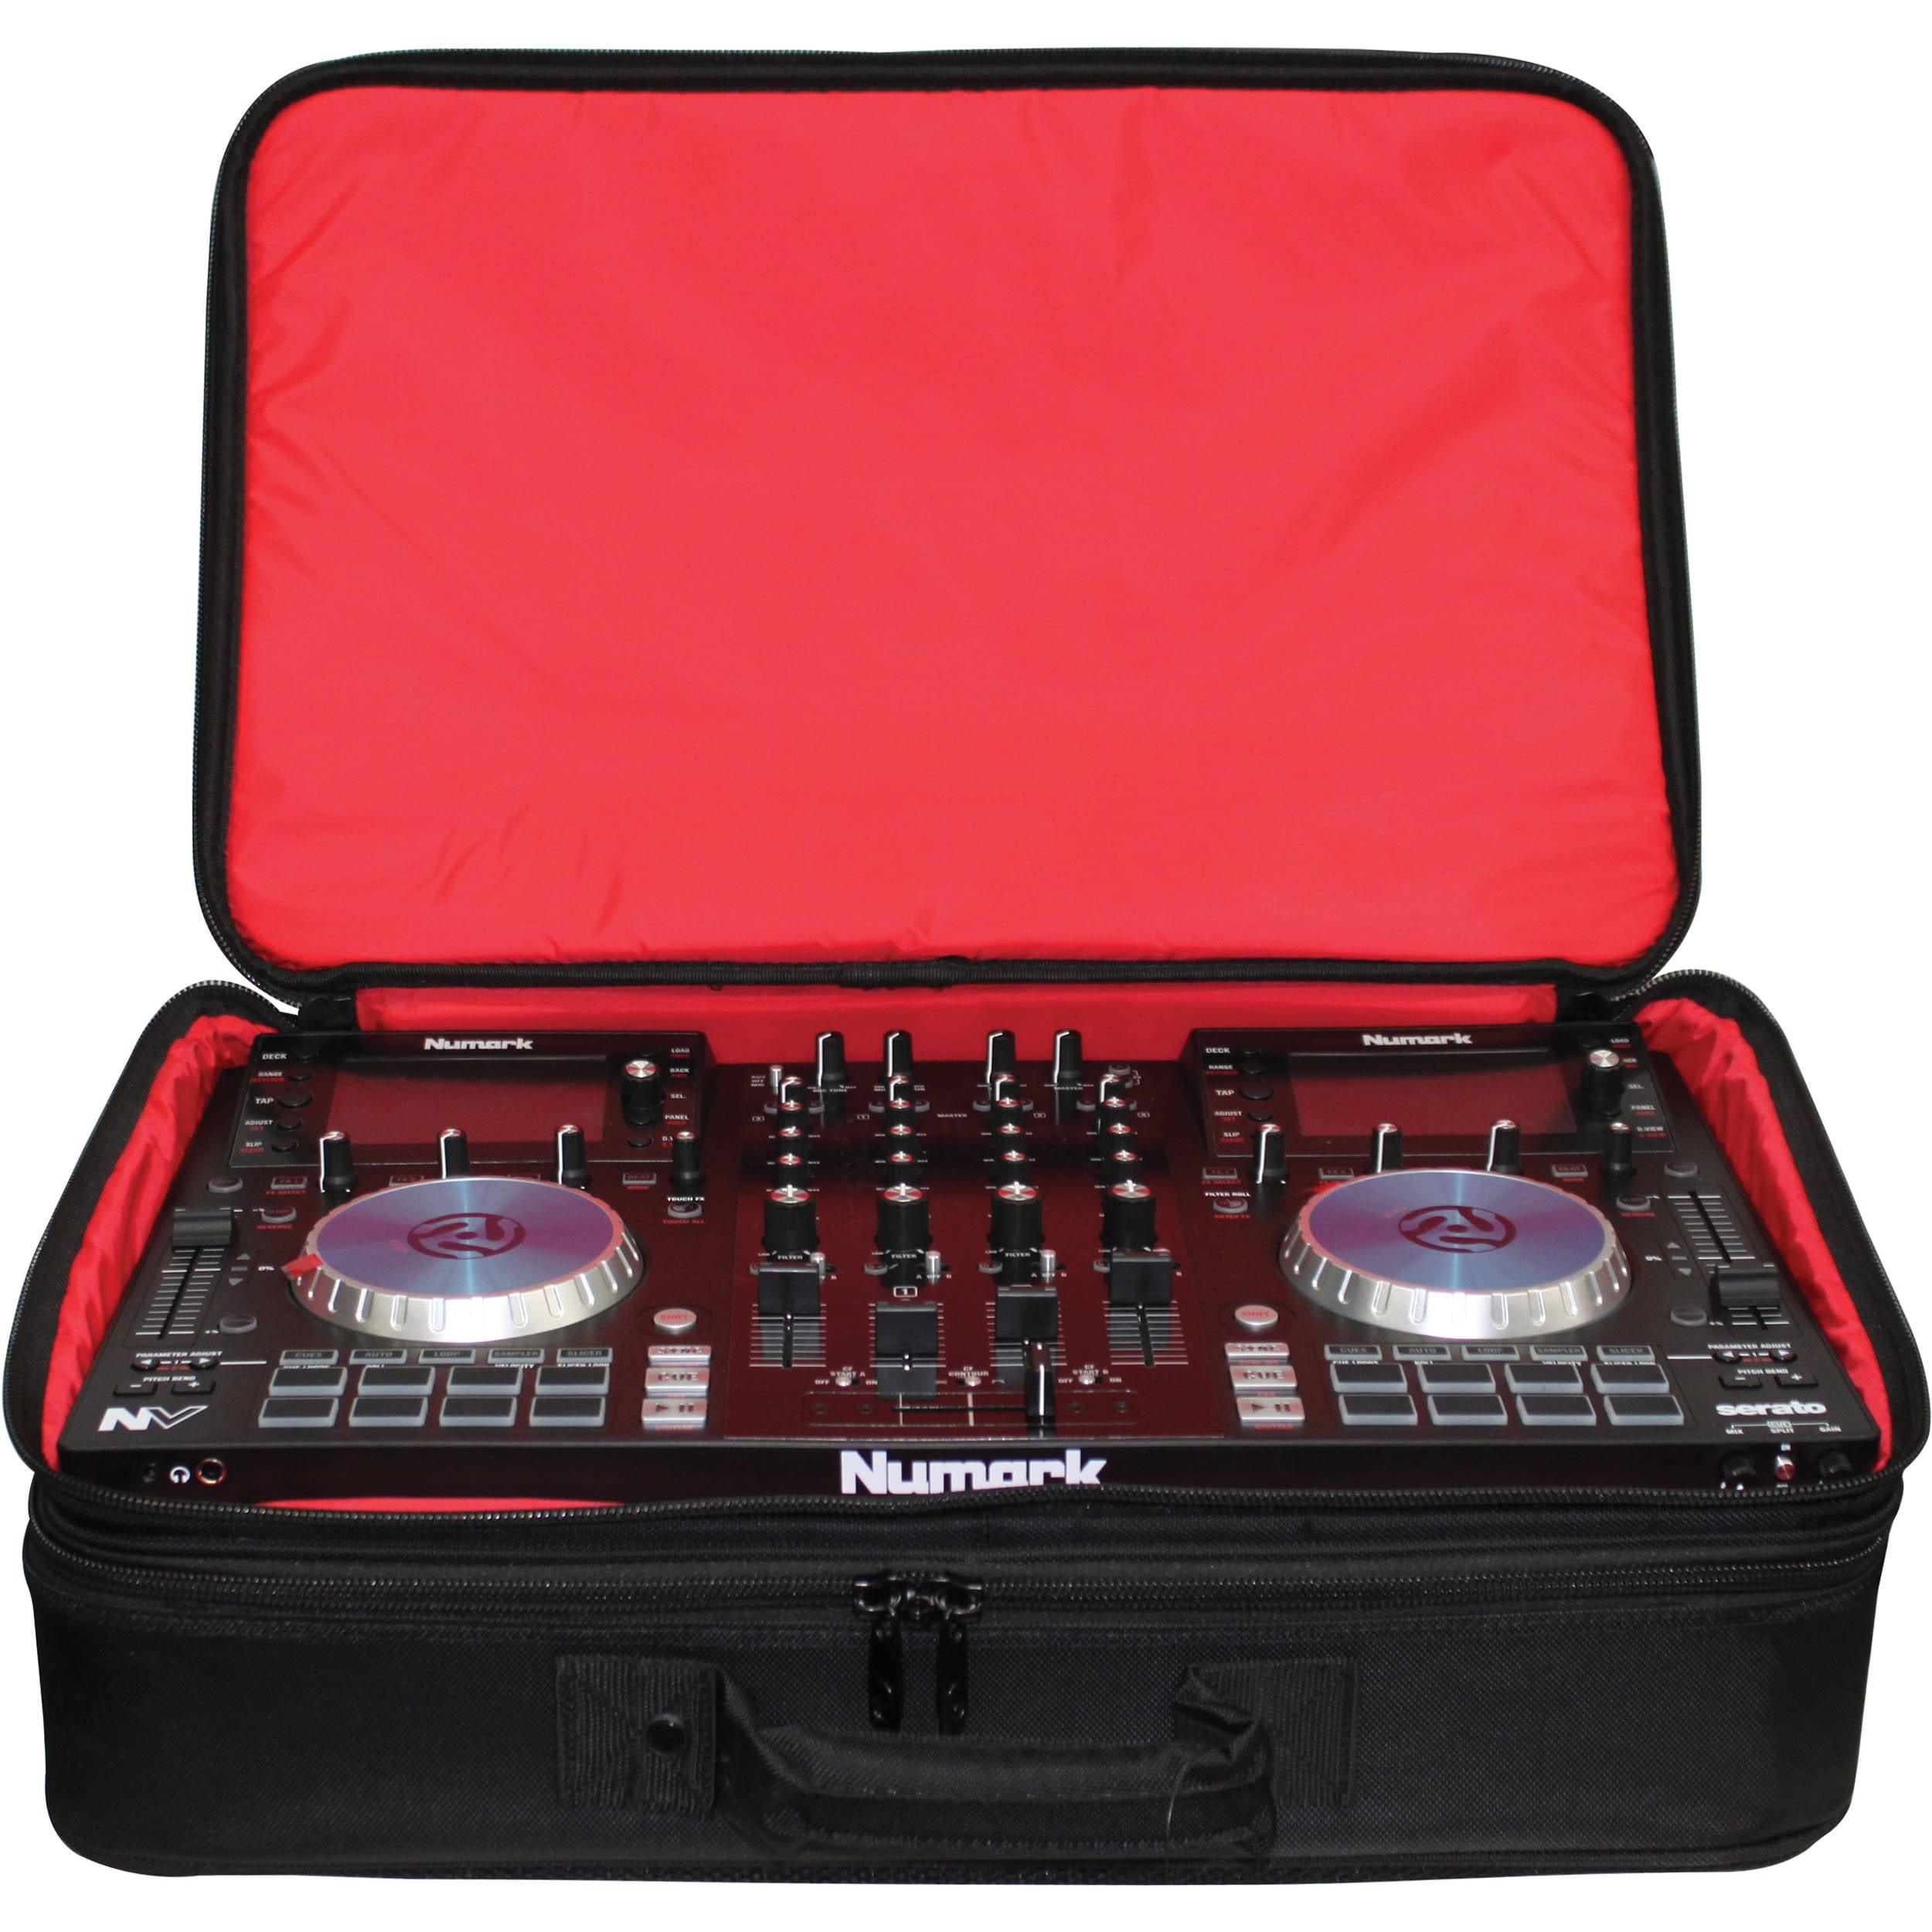 Odyssey BRLDIGITALXLE Redline Series Digital XLE DJ Controller & Gear Bag by Odyssey